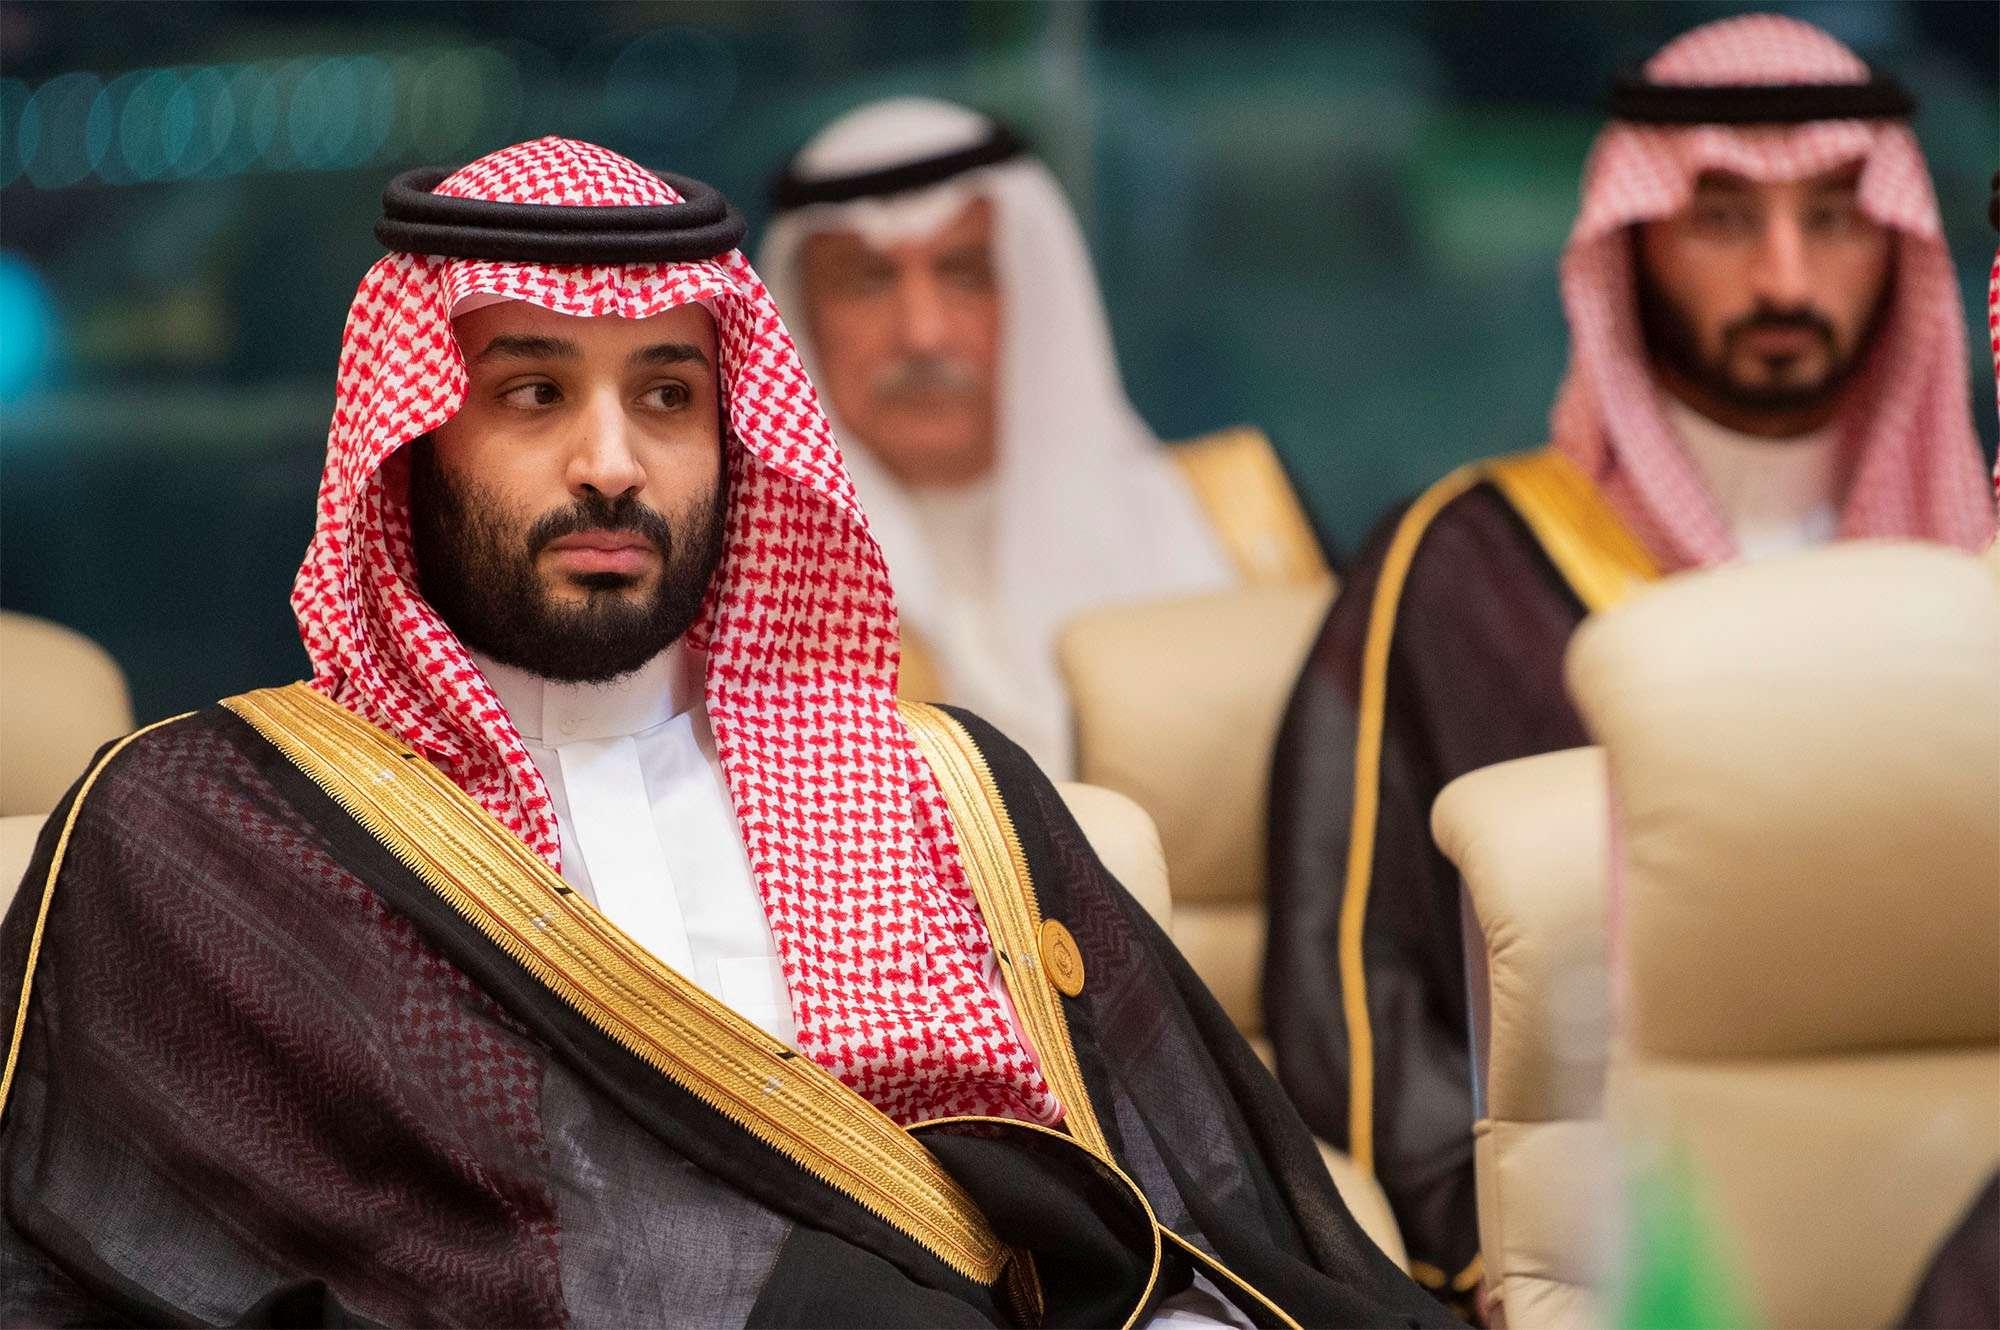 20190531001305reup--2019-05-31t001204z_495522705_rc182a708080_rtrmadp_3_saudi-summit.h